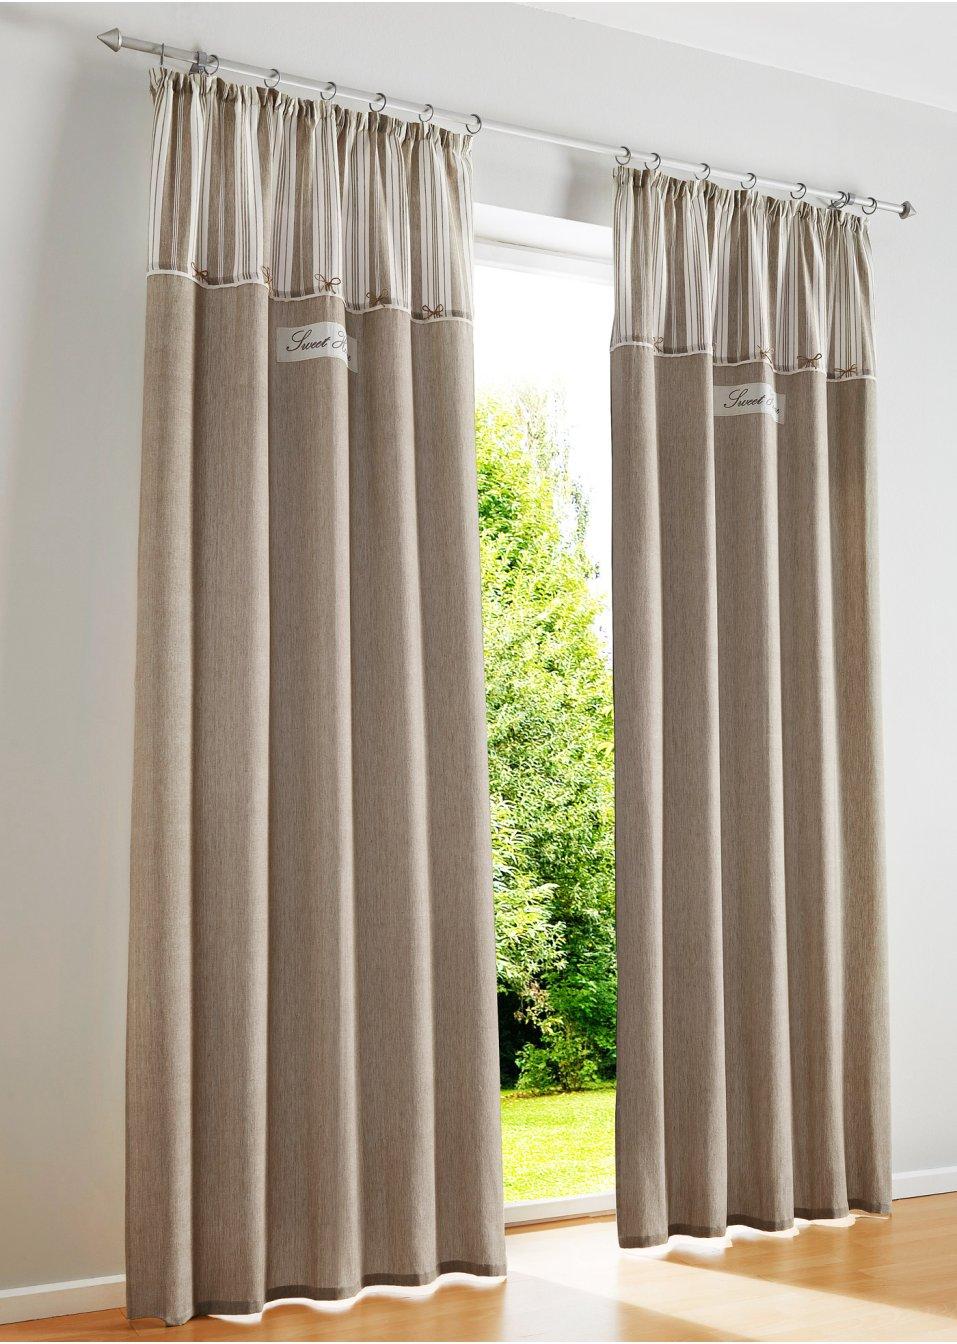 Sch ner blickfang vorhang zoey aus baumwolle natur - Bonprix vorhang ...